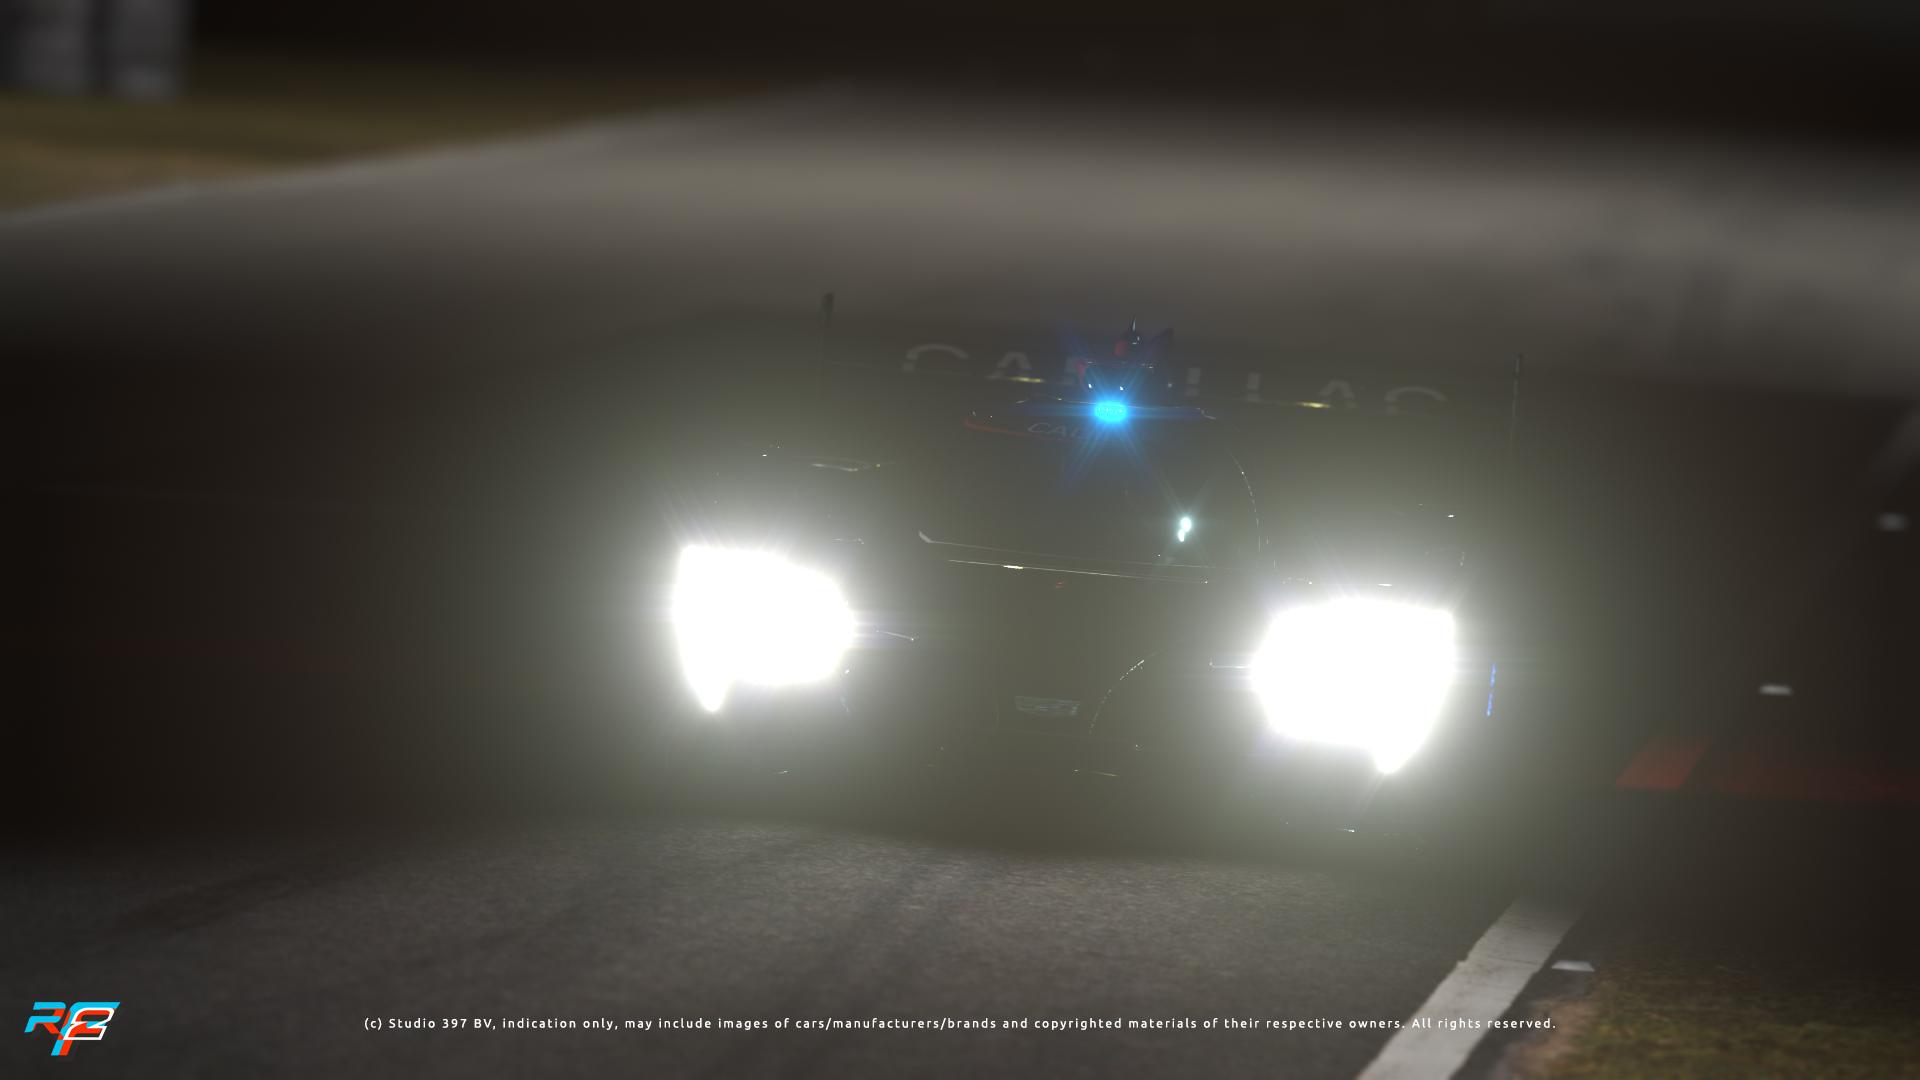 Cadillac_DPi_2020_01.jpg